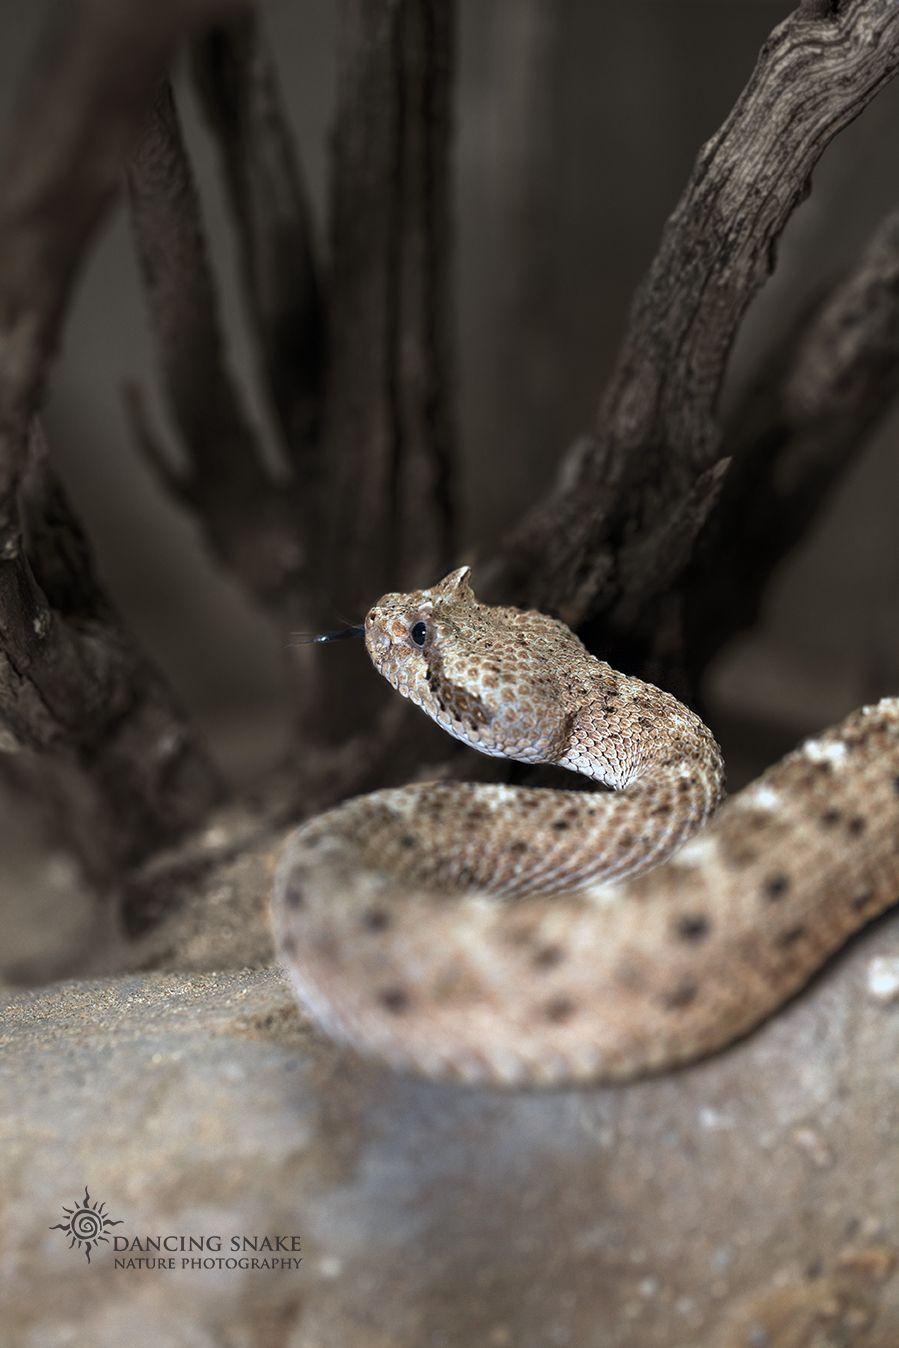 Reptiles Snakes Rattlesnakes Desert Sidewinder One Of The